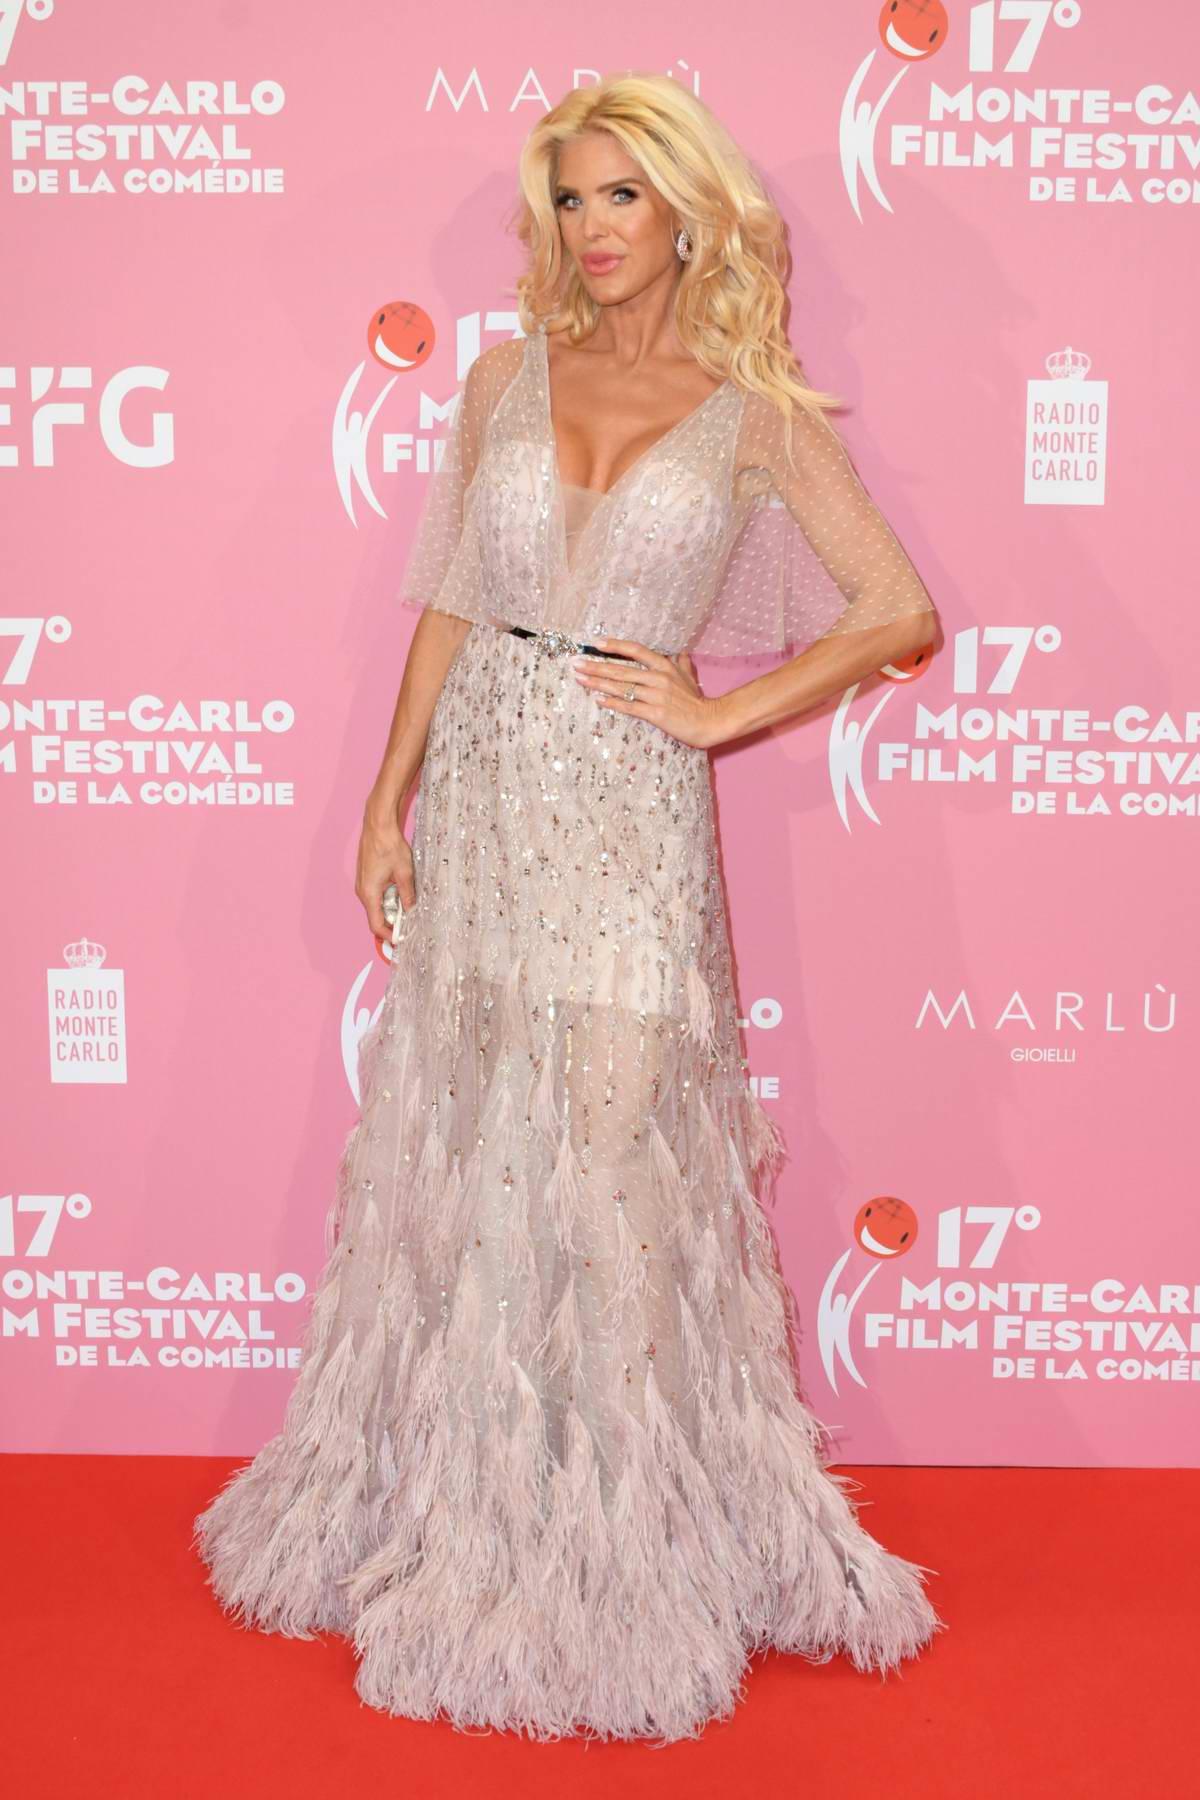 Victoria Silvstedt attends the Red Carpet Gala and awards ceremony during the 17° Monte-Carlo Film Festival De La Comedie in Monaco